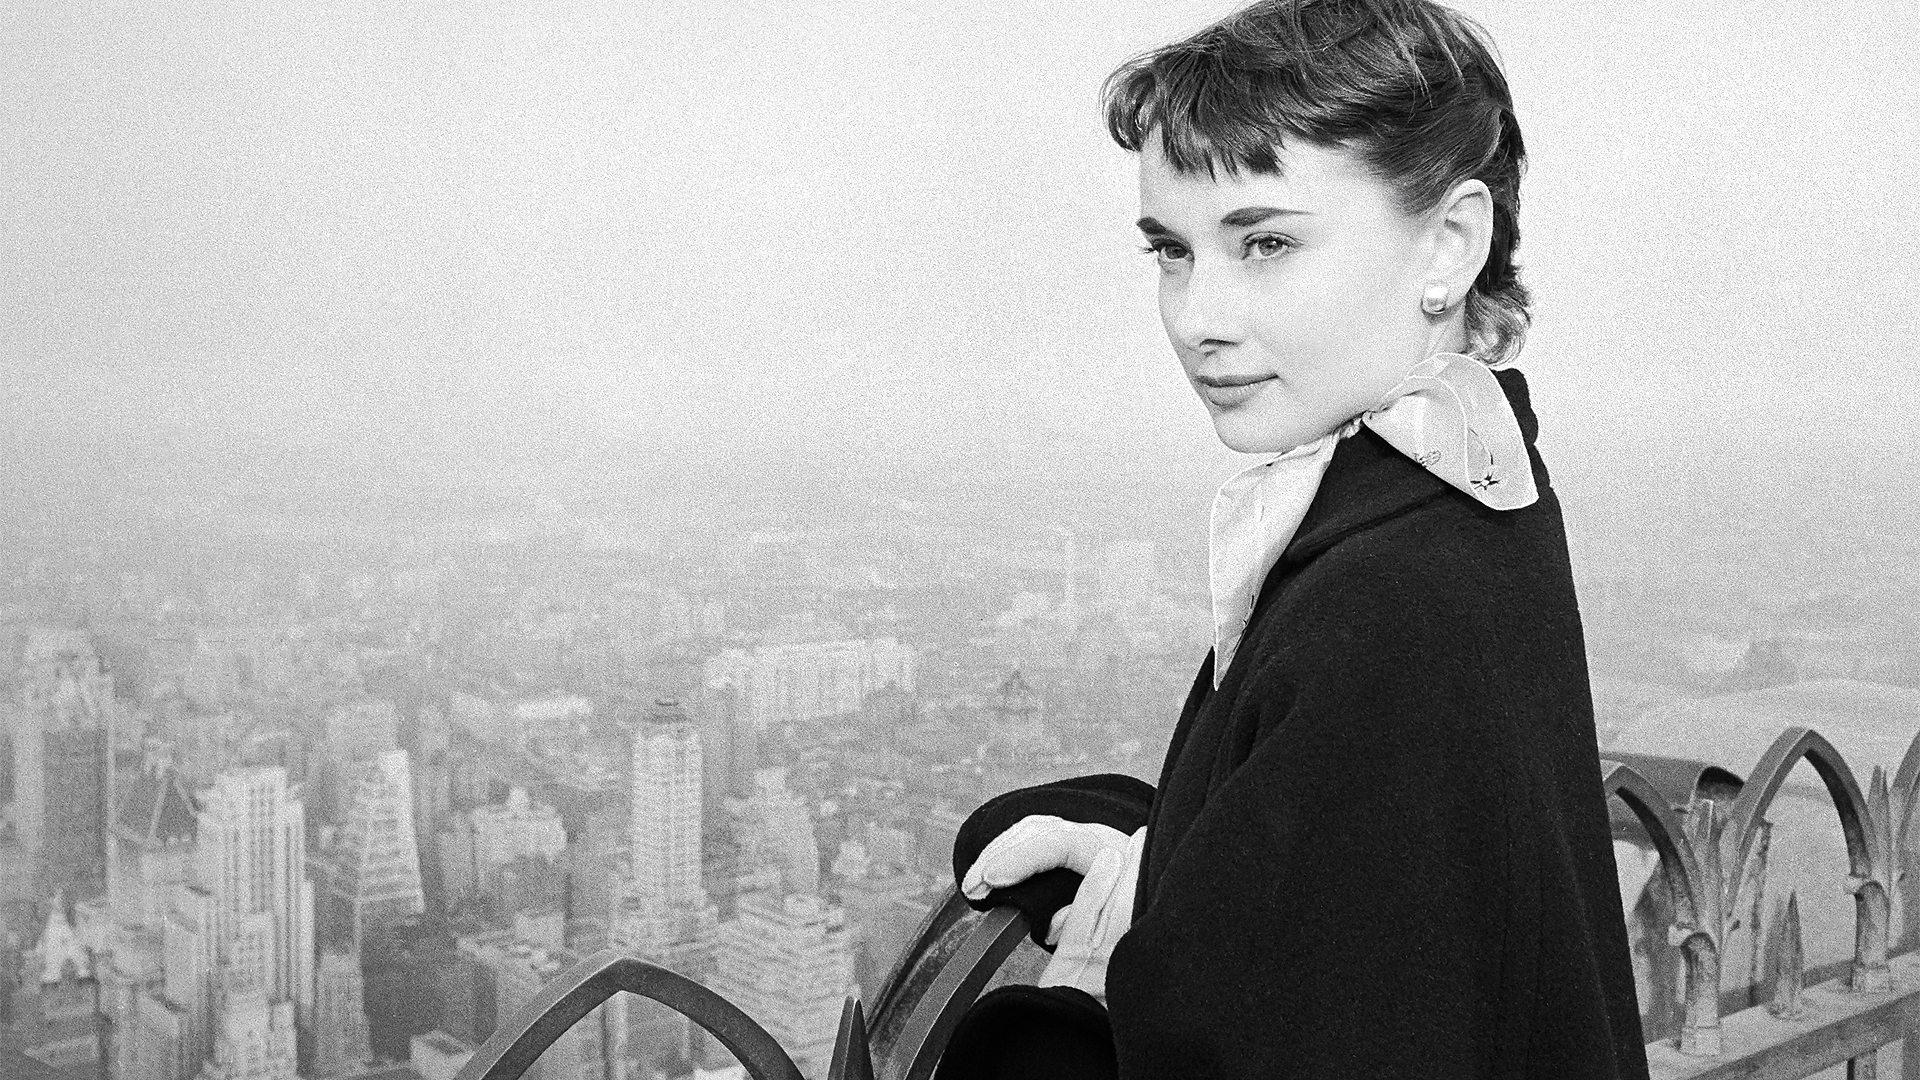 BBC Arts - Shooting stars: Lost photographs of Audrey Hepburn, Gary Cooper & Vivien Leigh by 'Speedy George'